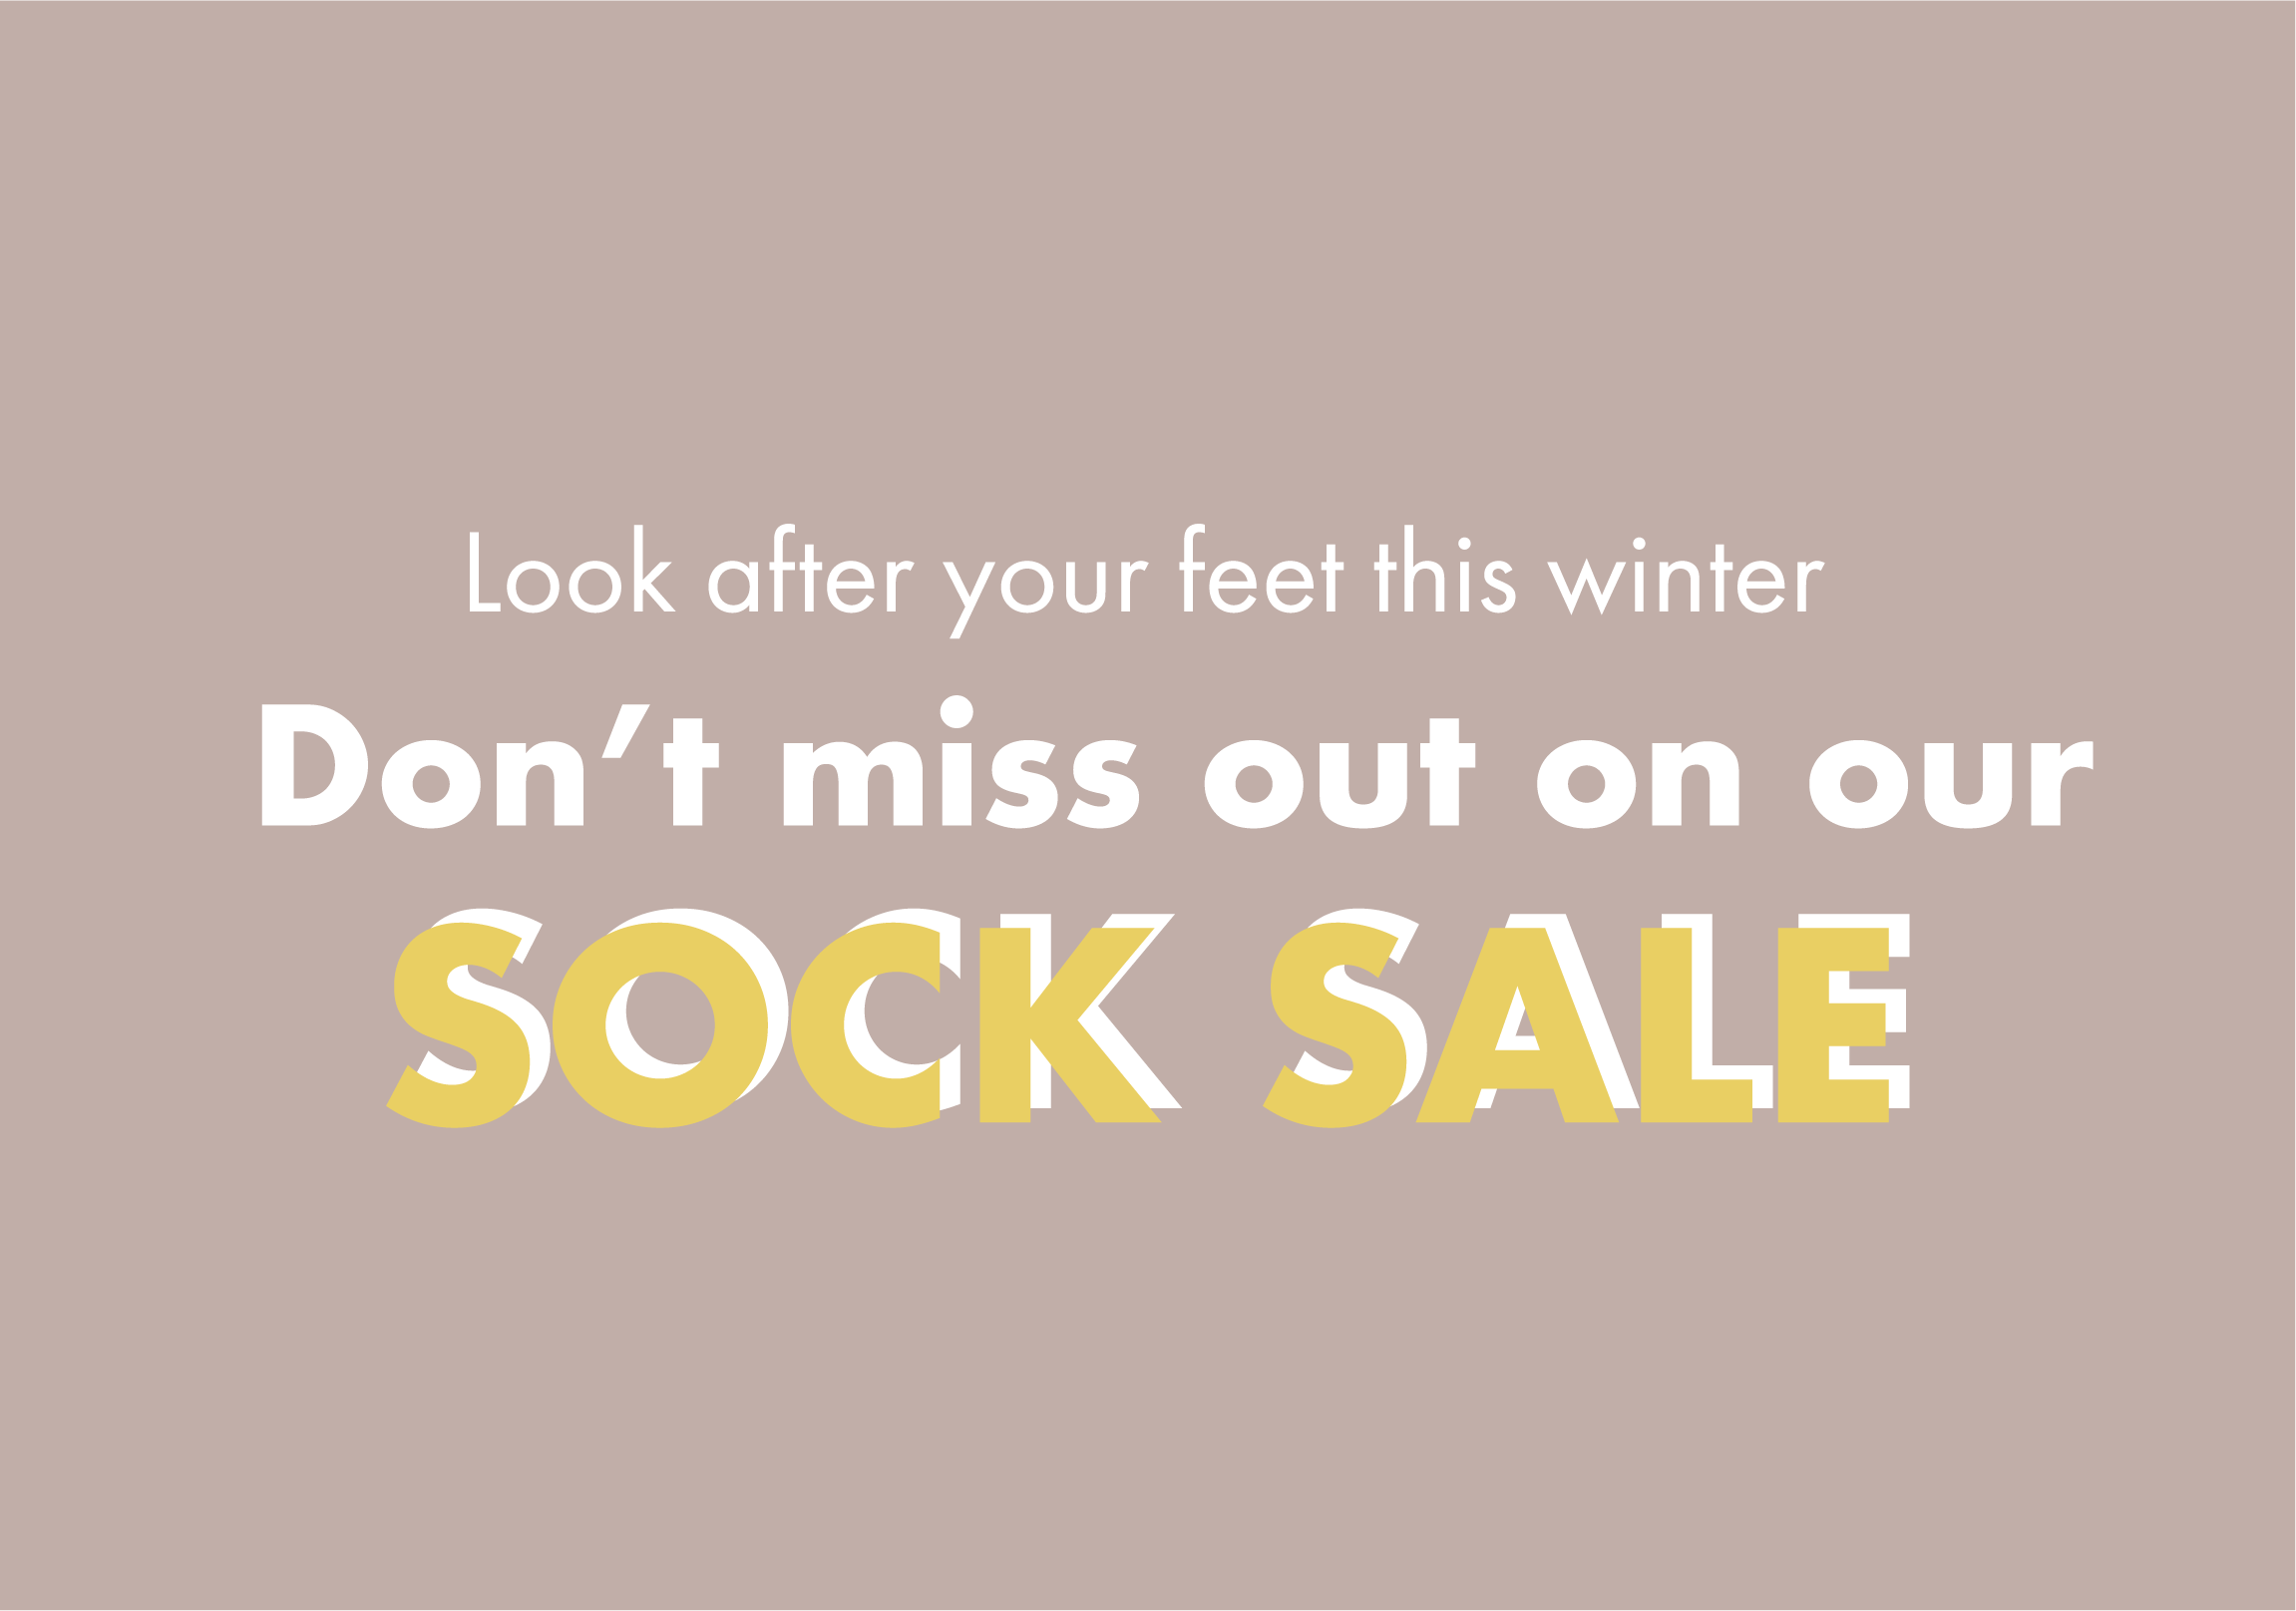 Winter sale for socks image